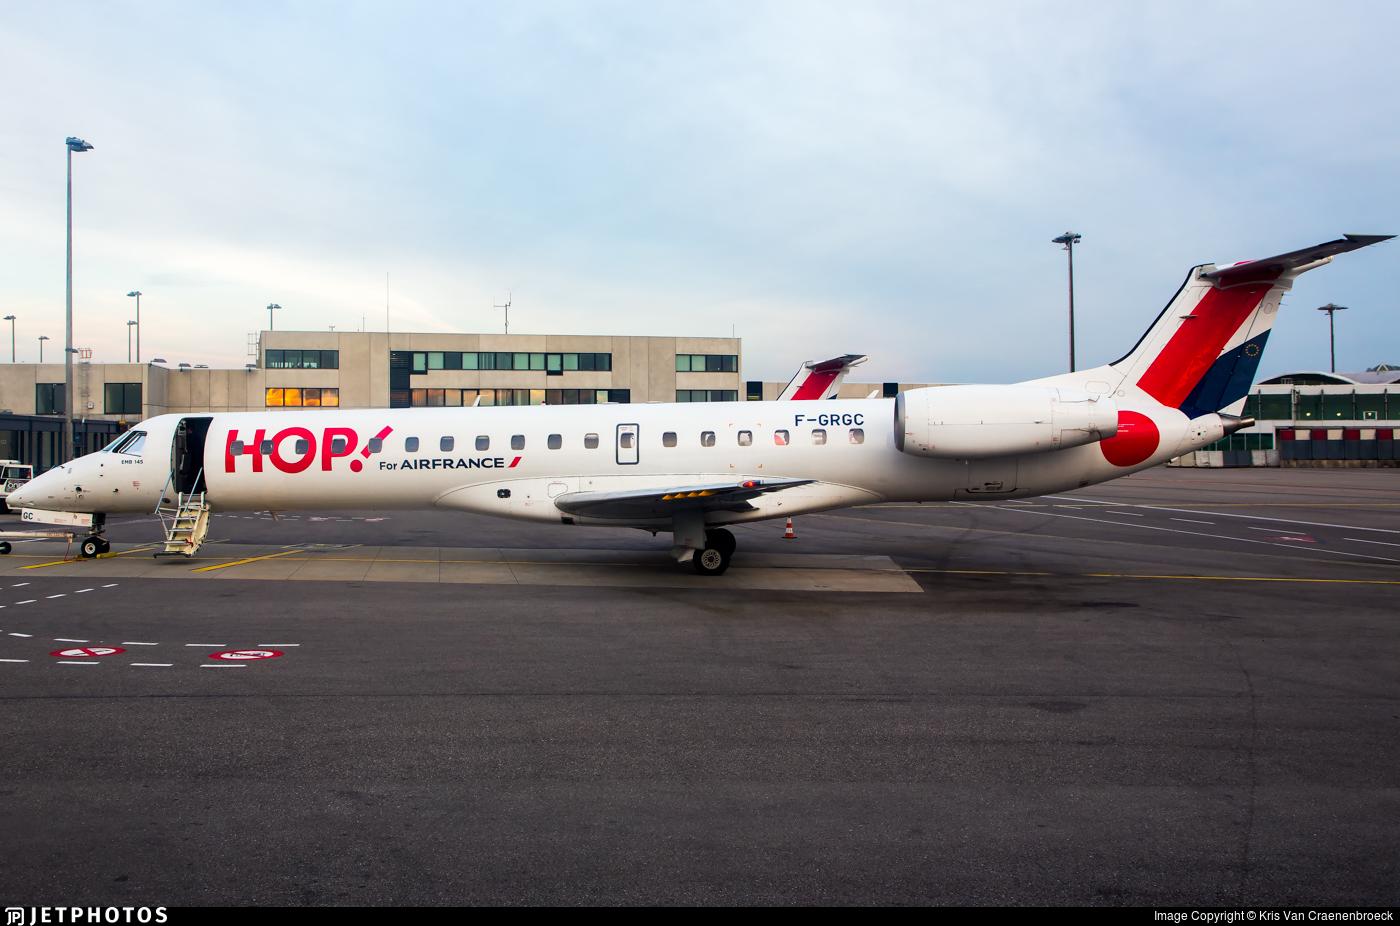 F-GRGC - Embraer ERJ-145EP - HOP! for Air France